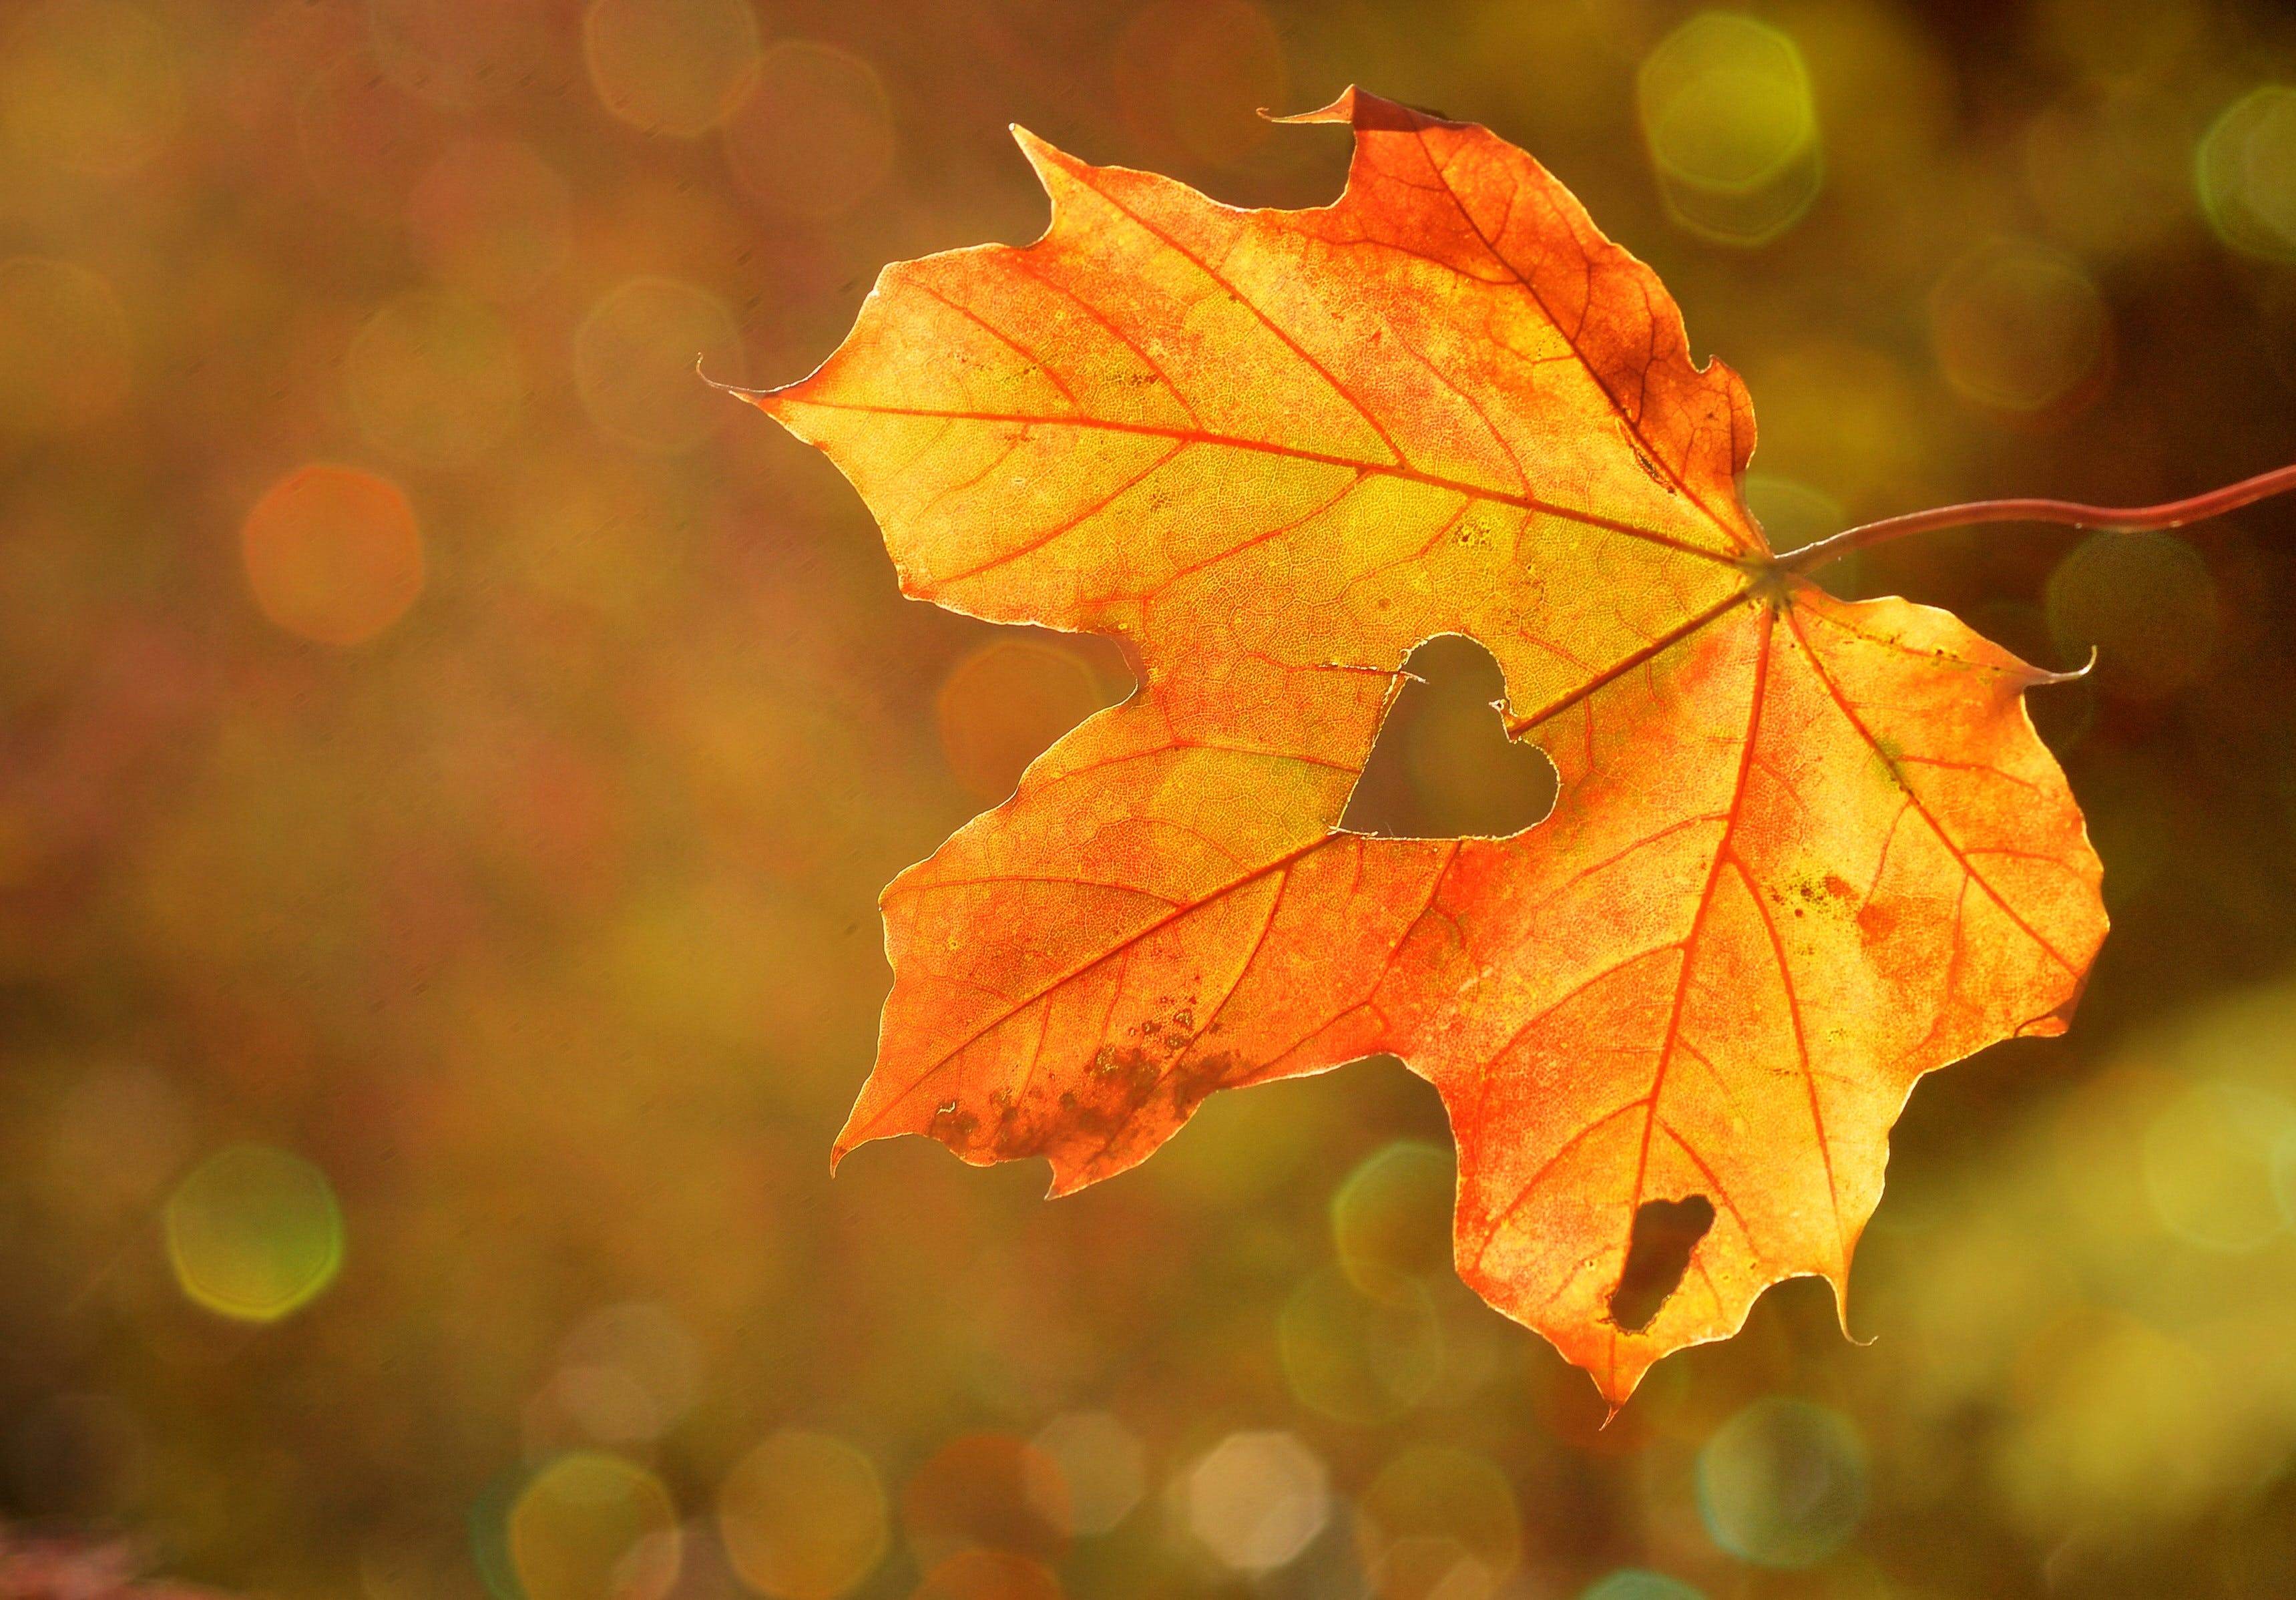 Free stock photo of nature, heart, leaf, autumn